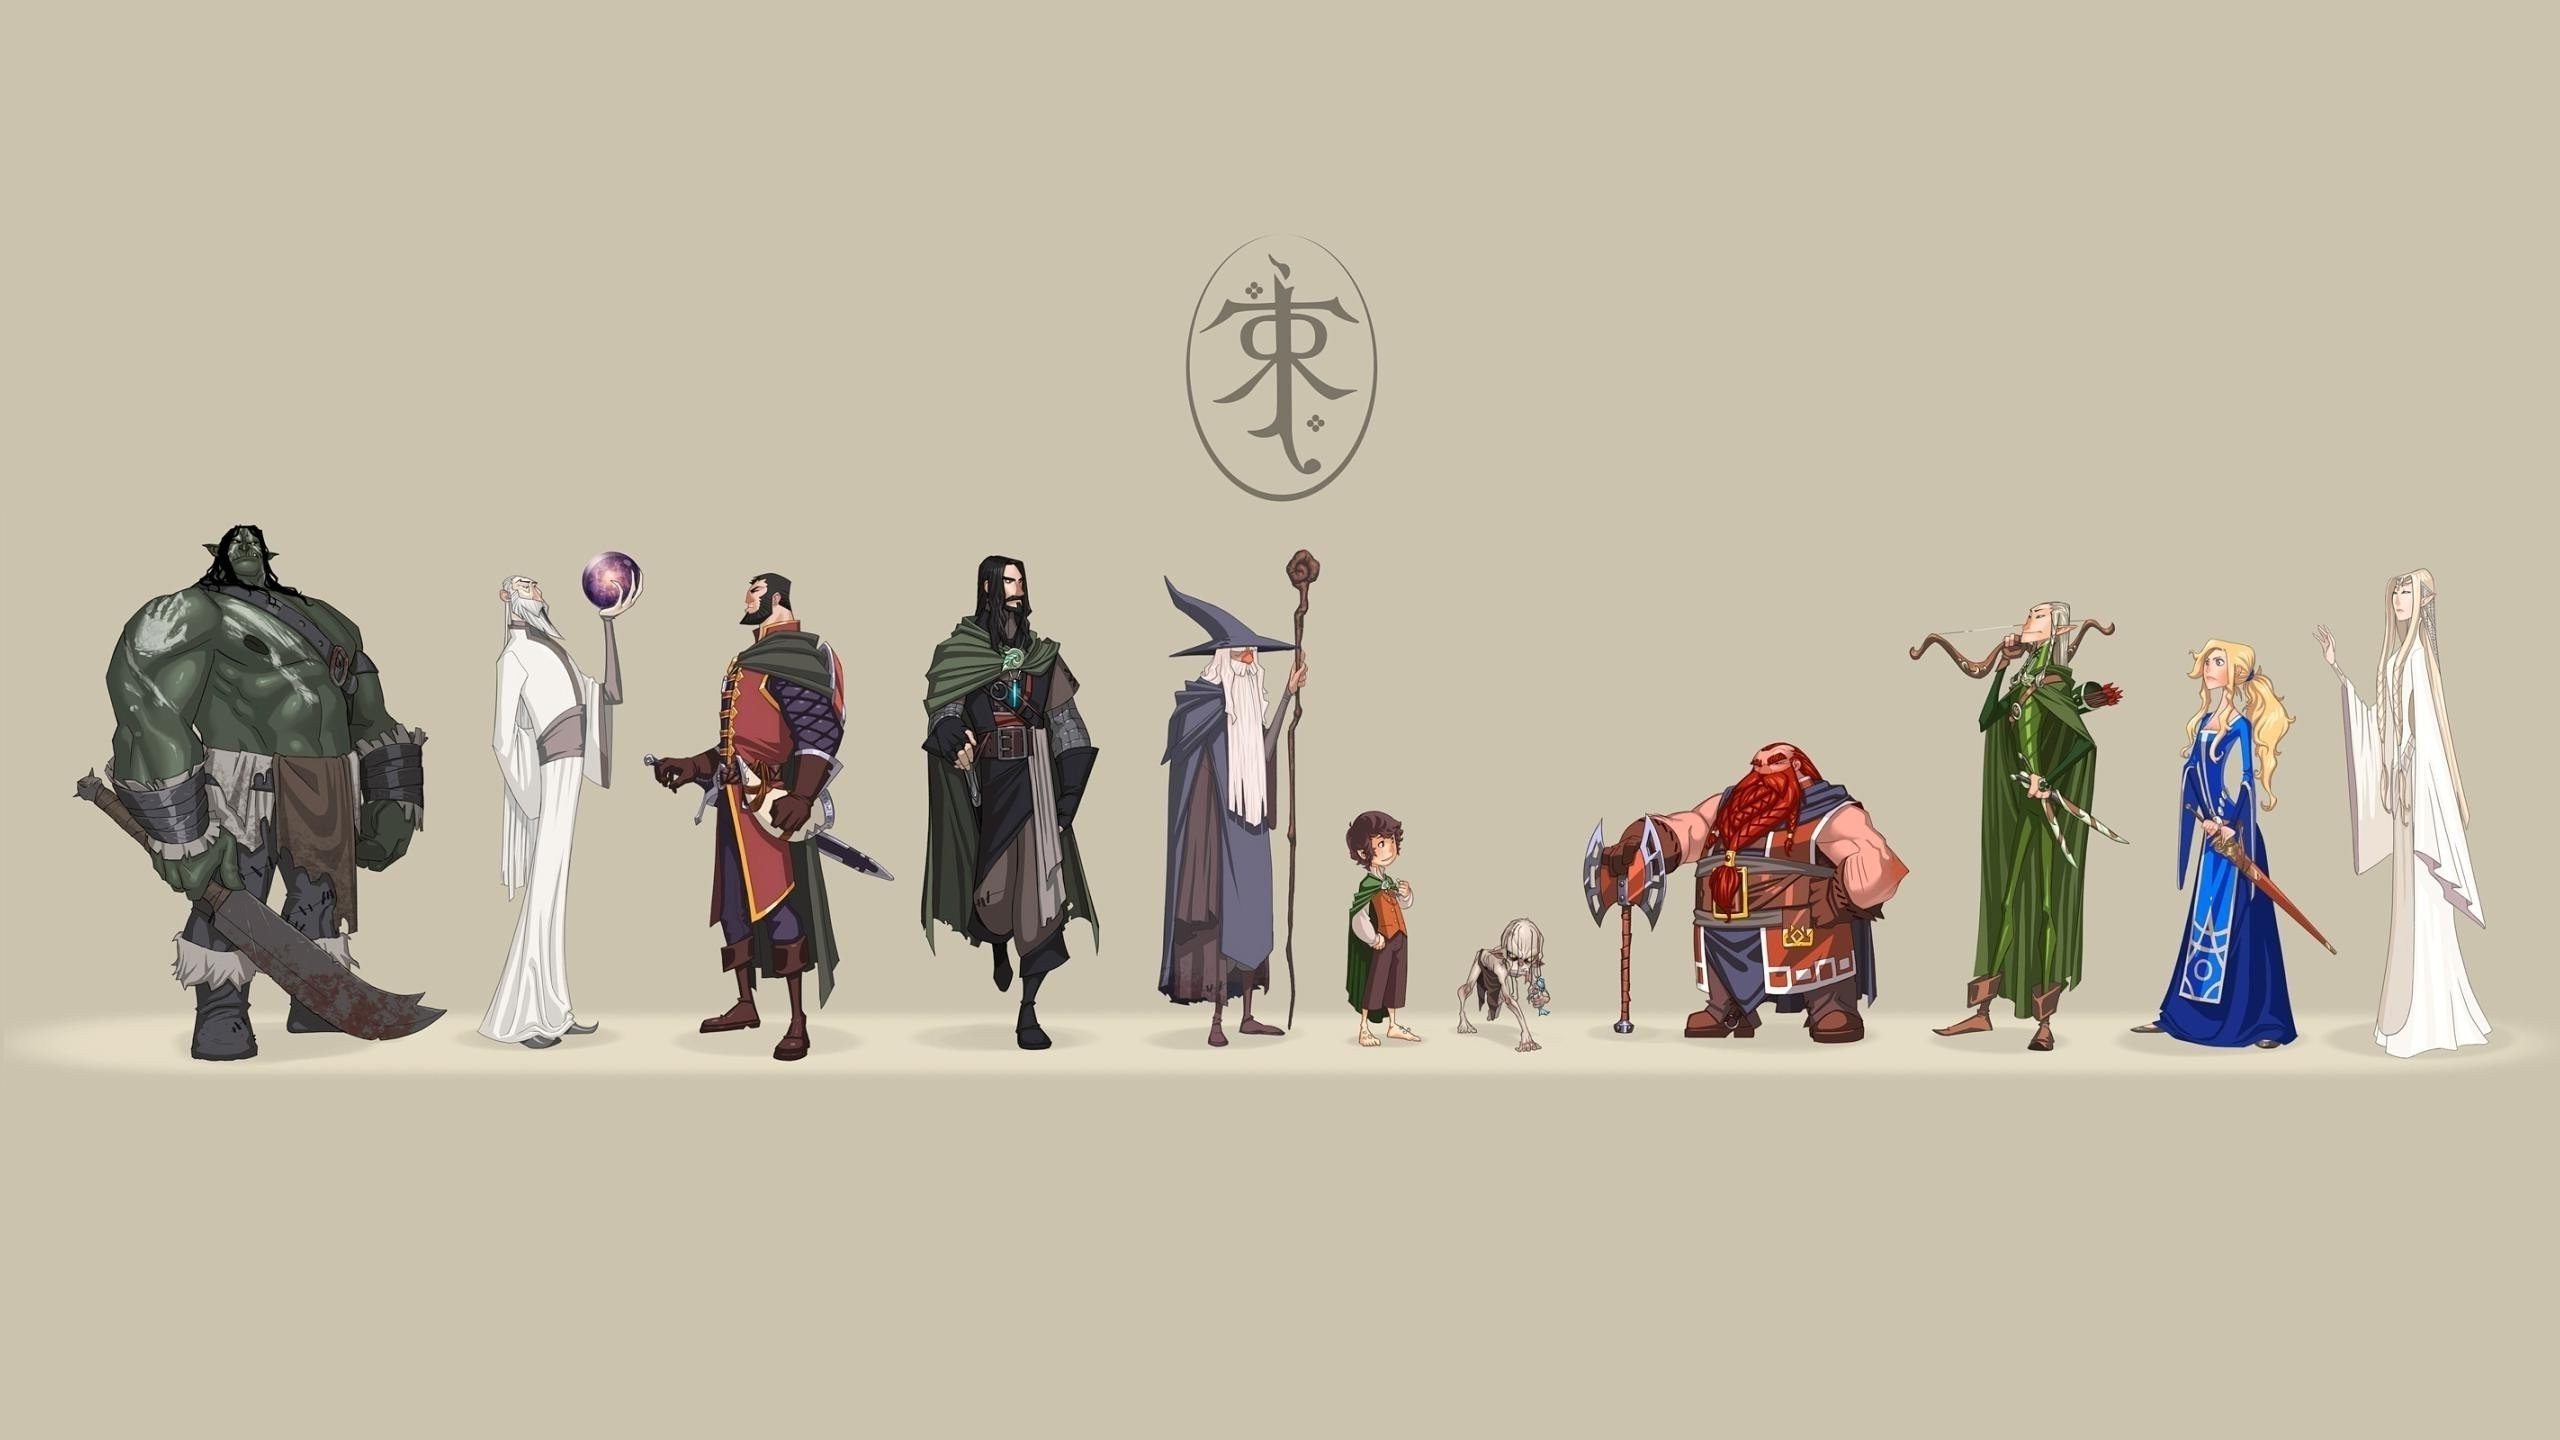 Res: 2560x1440, the lord of the rings j r r_ tolkien frodo baggins gollum gimli aragorn  saruman legolas artwork boromir galadriel wallpaper and background